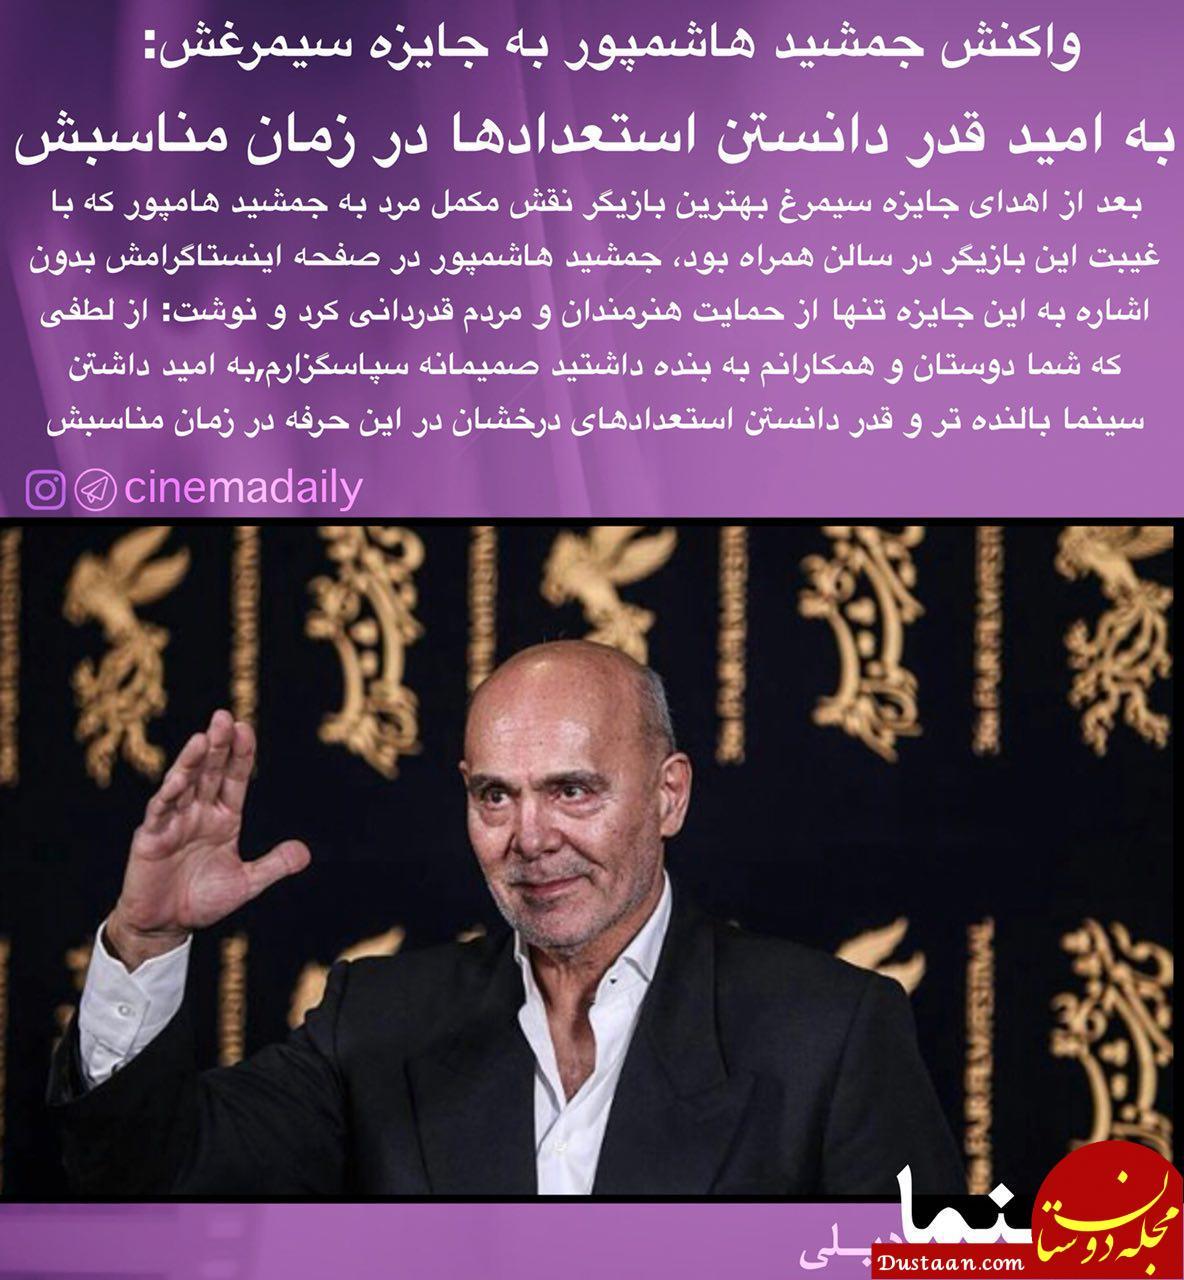 www.dustaan.com واکنش جمشید هاشم پور به جایزه سیمرغ اش! +عکس